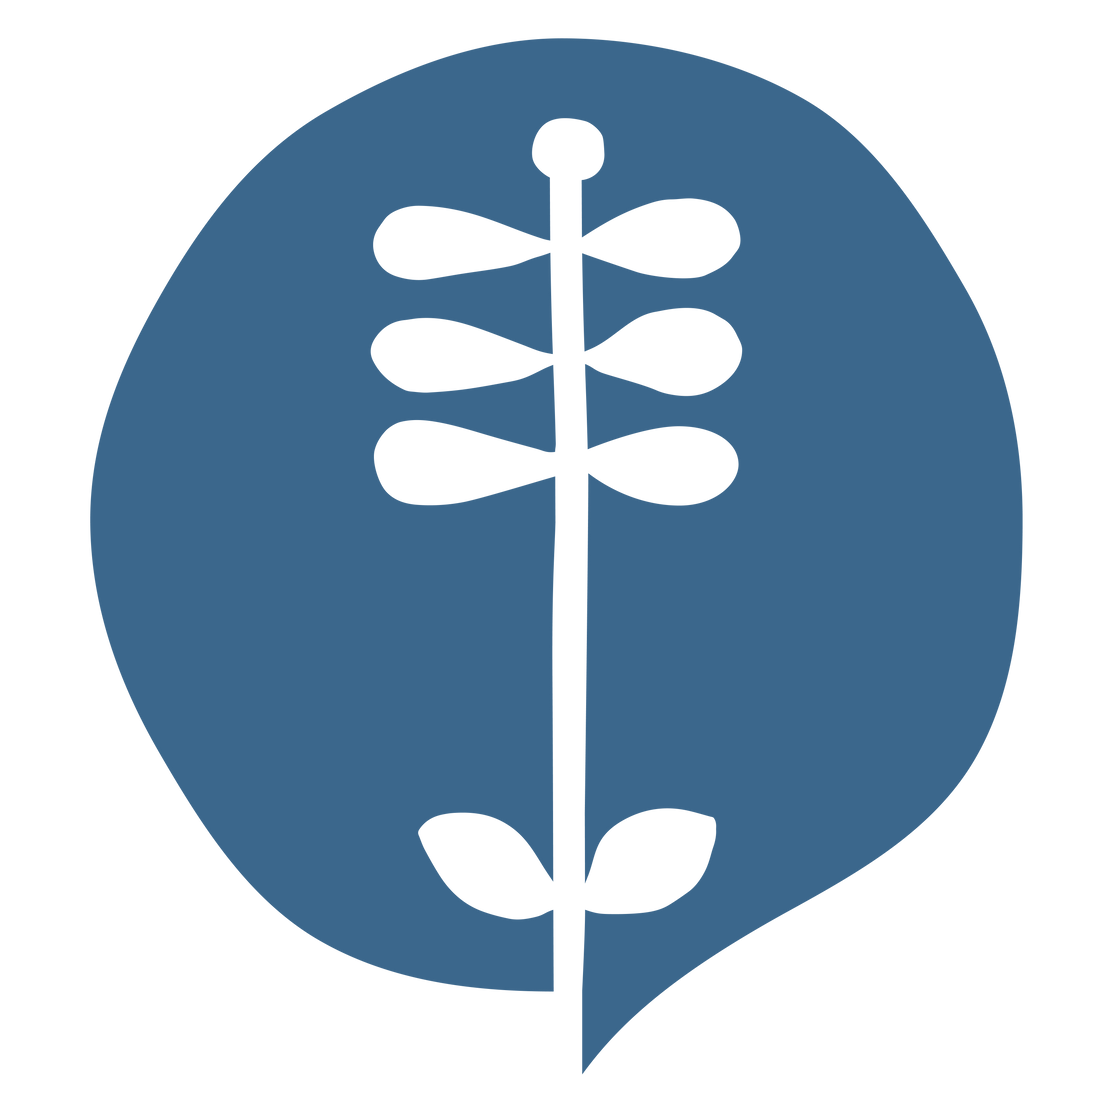 K. Hackl Logo blue icon_K. Hackl Icon Bl